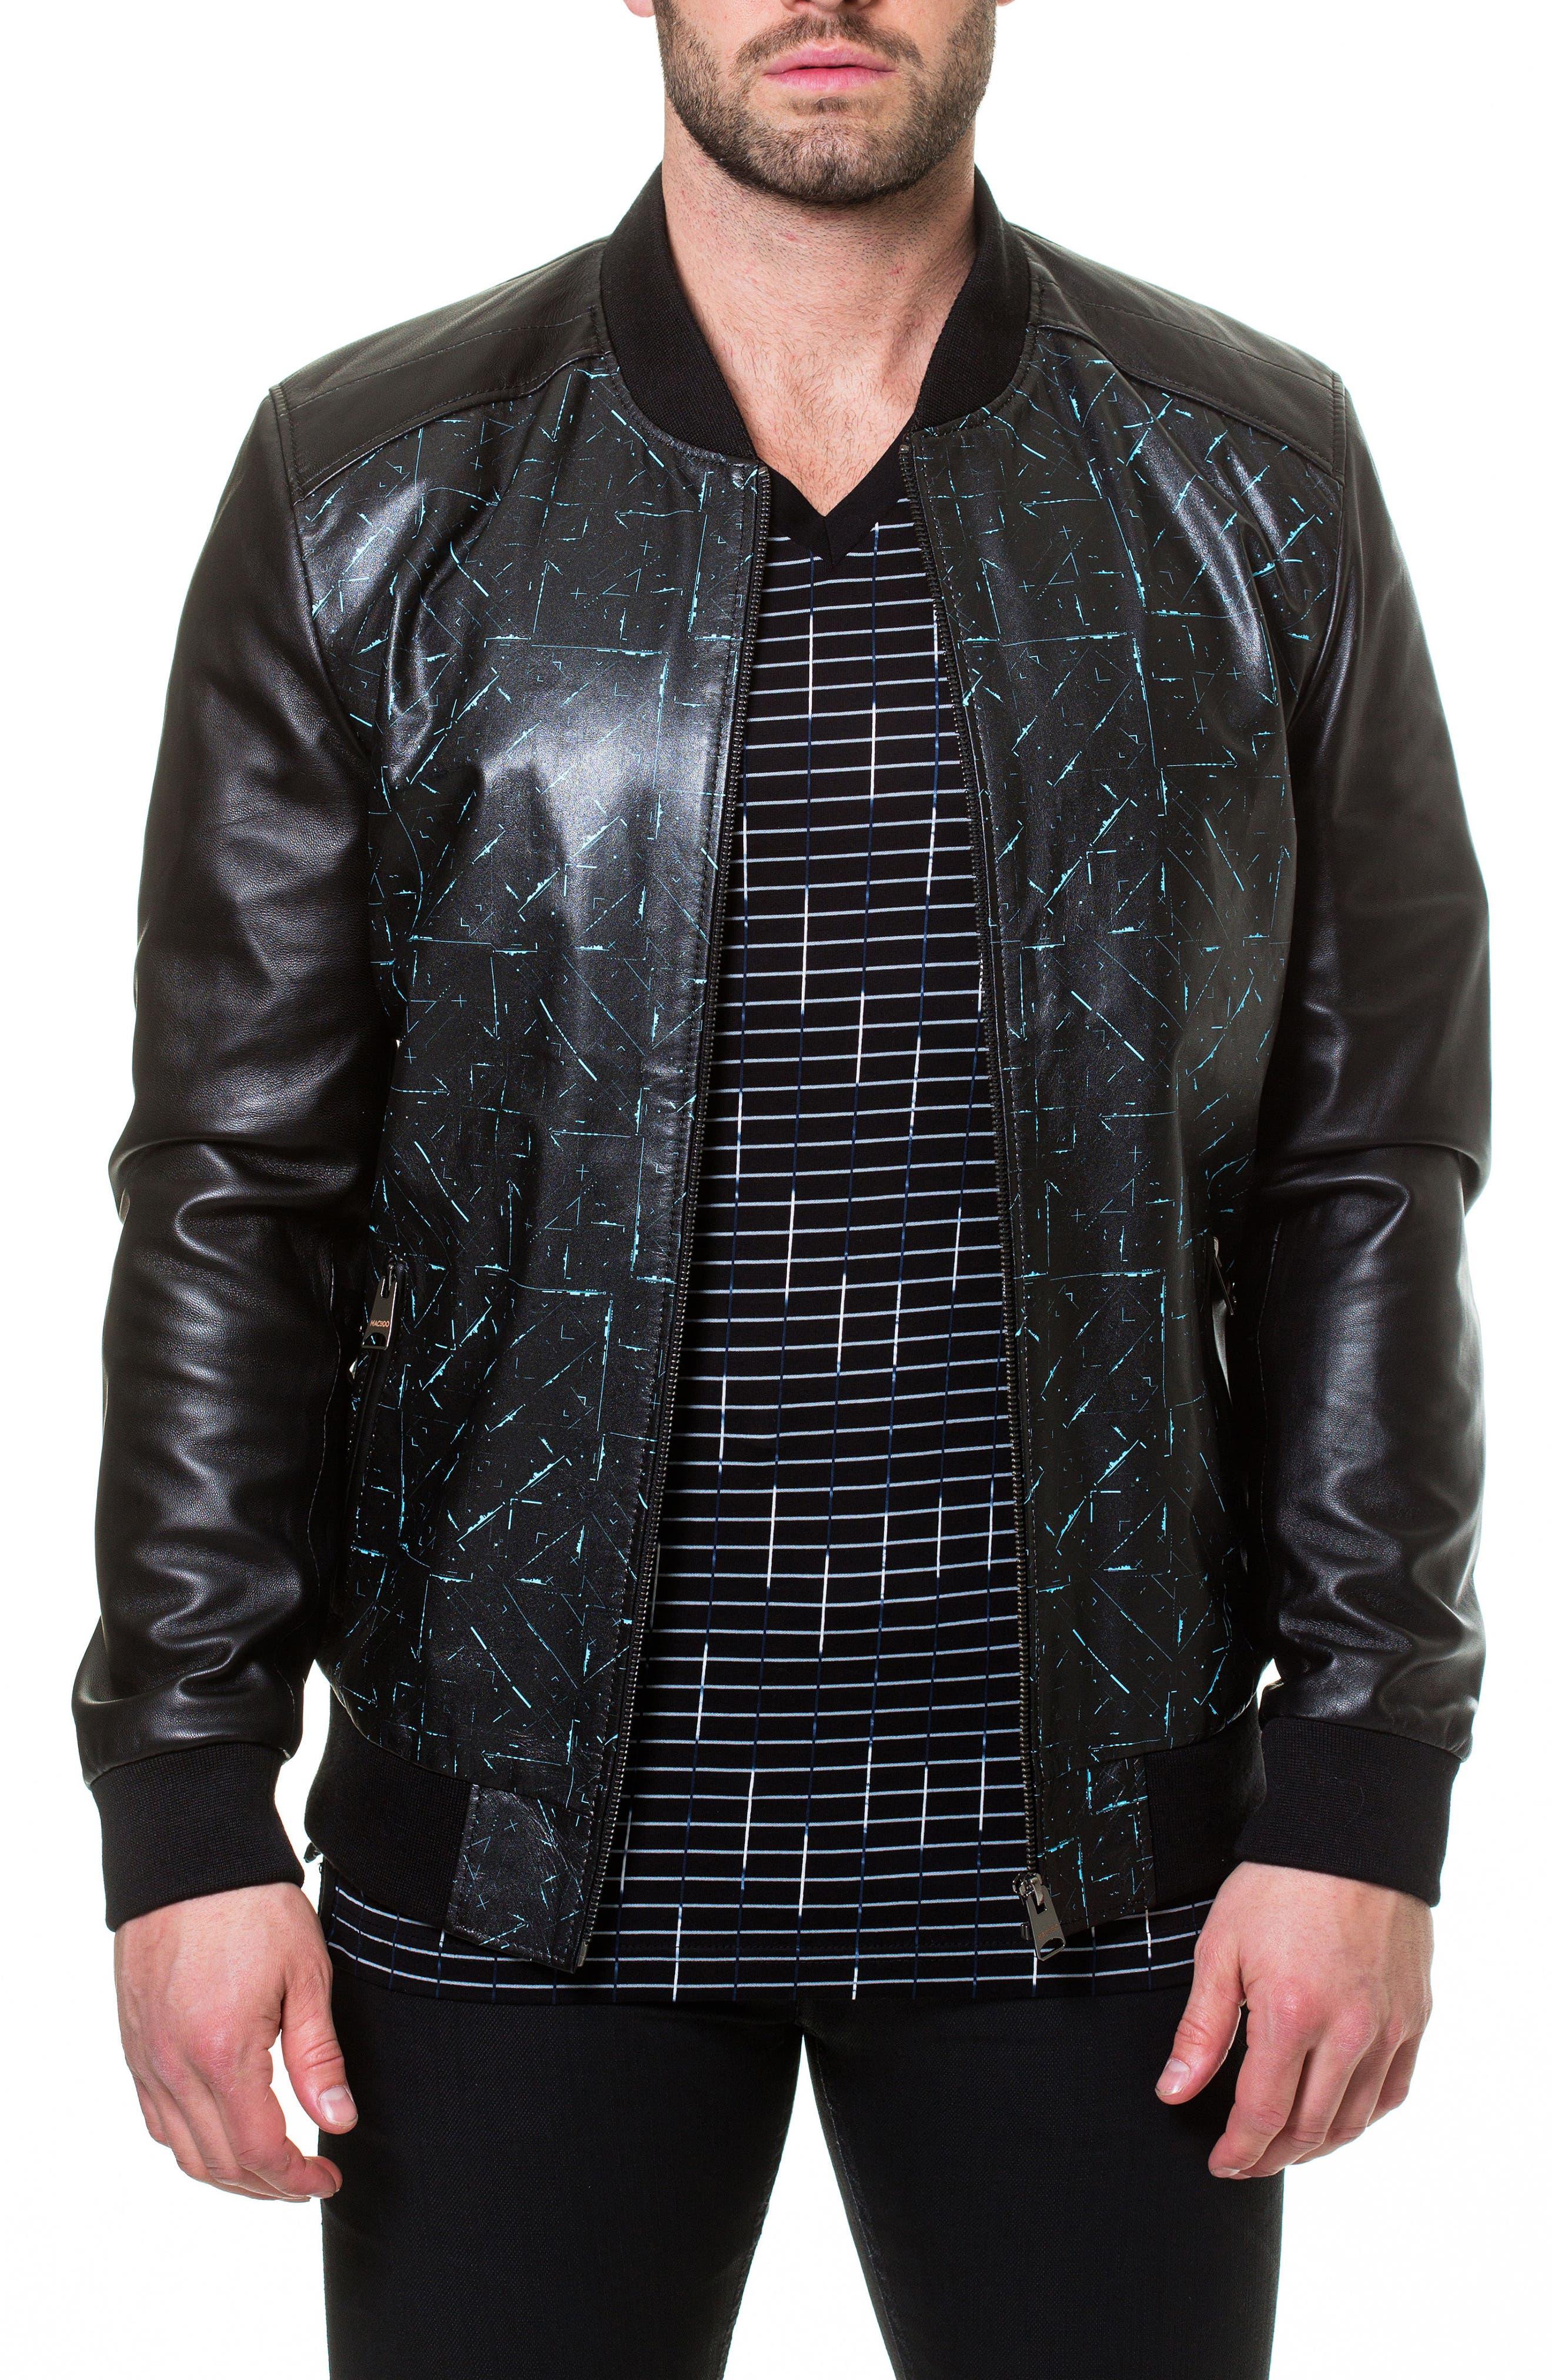 Tron Print Leather Jacket,                             Alternate thumbnail 3, color,                             Black